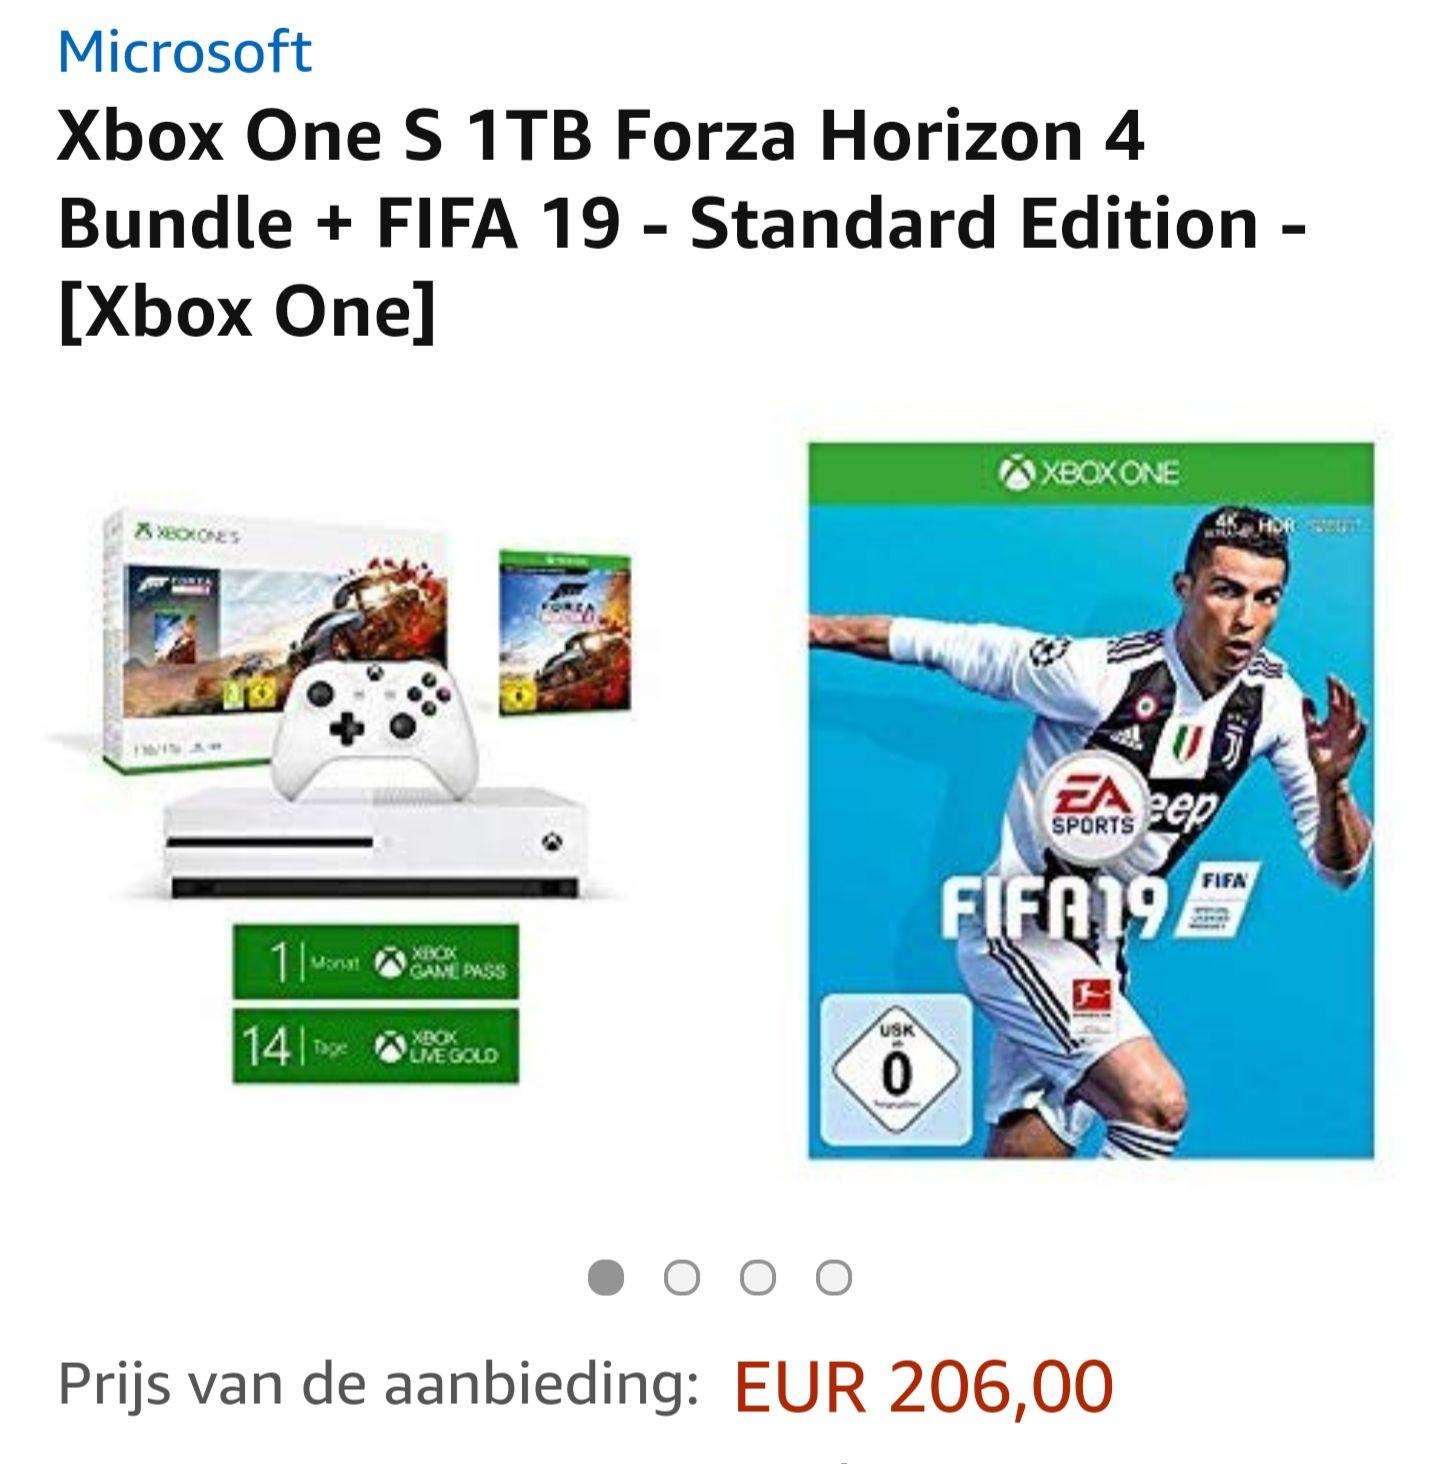 Xbox One S 1TB Forza Horizon 4 Bundle + FIFA 19 + 1 maand xbox game pass + 14 dagen gratis xbox live gold